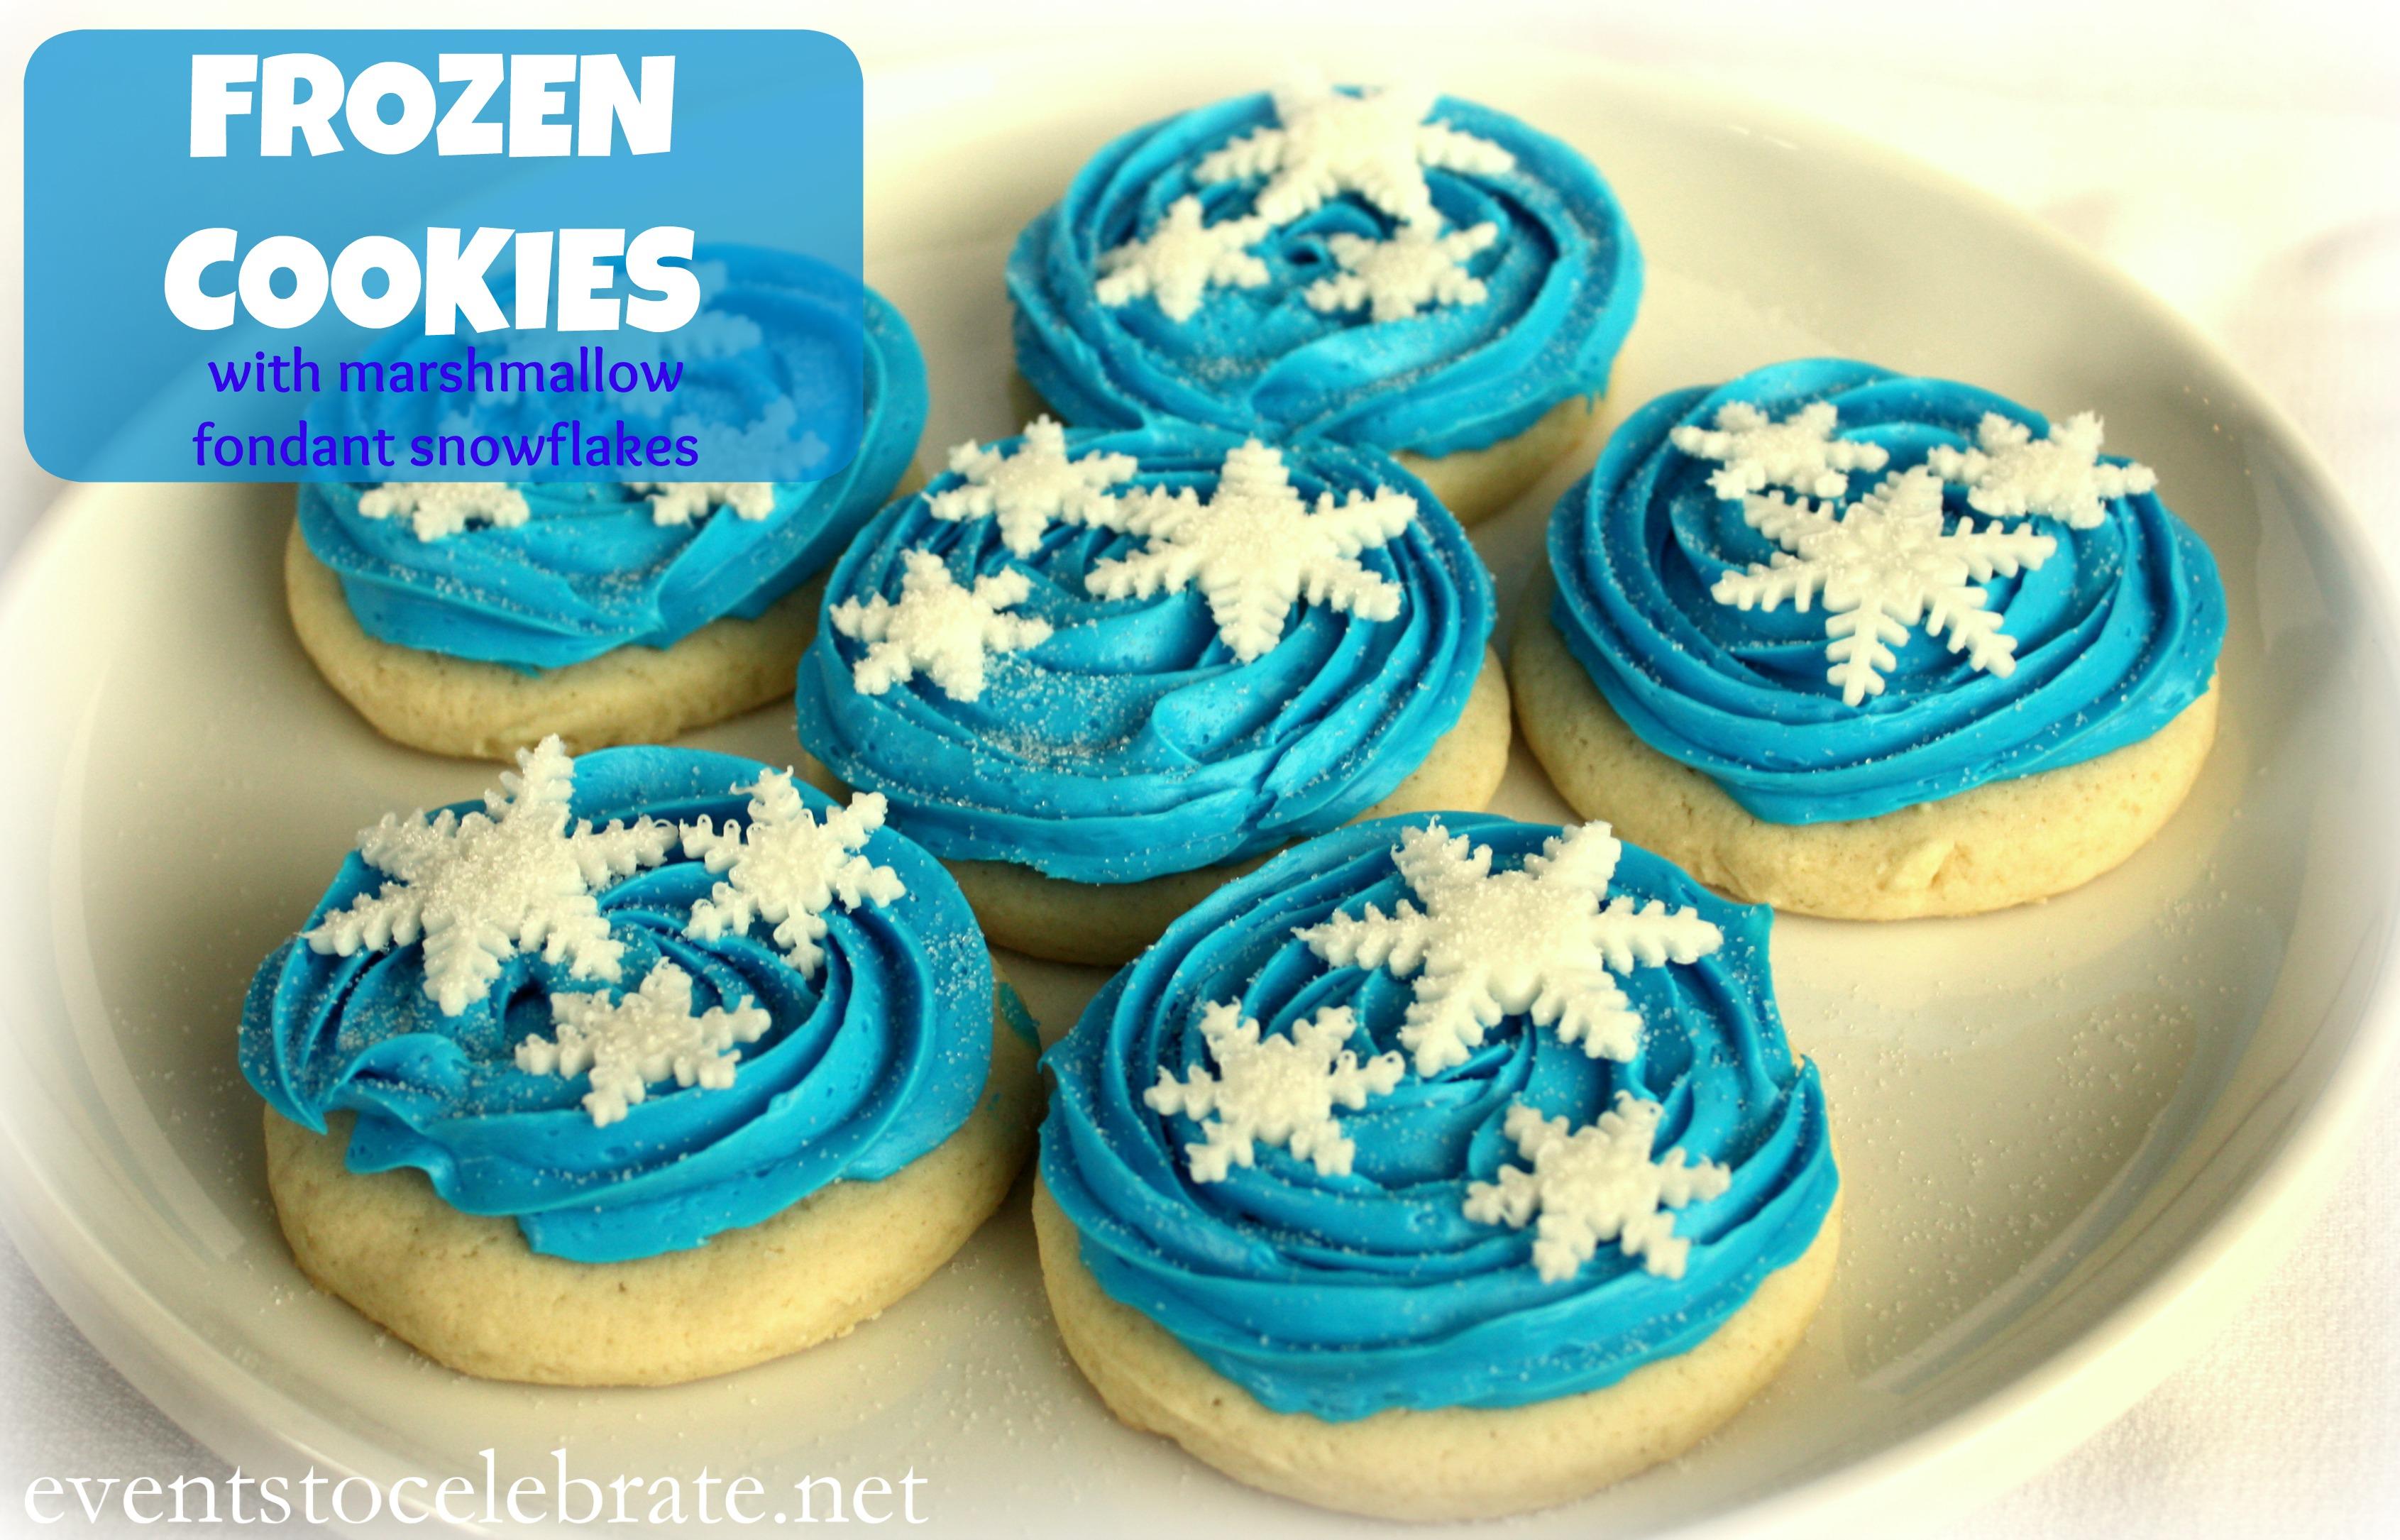 Frozen desserts - eventstocelebrate.net